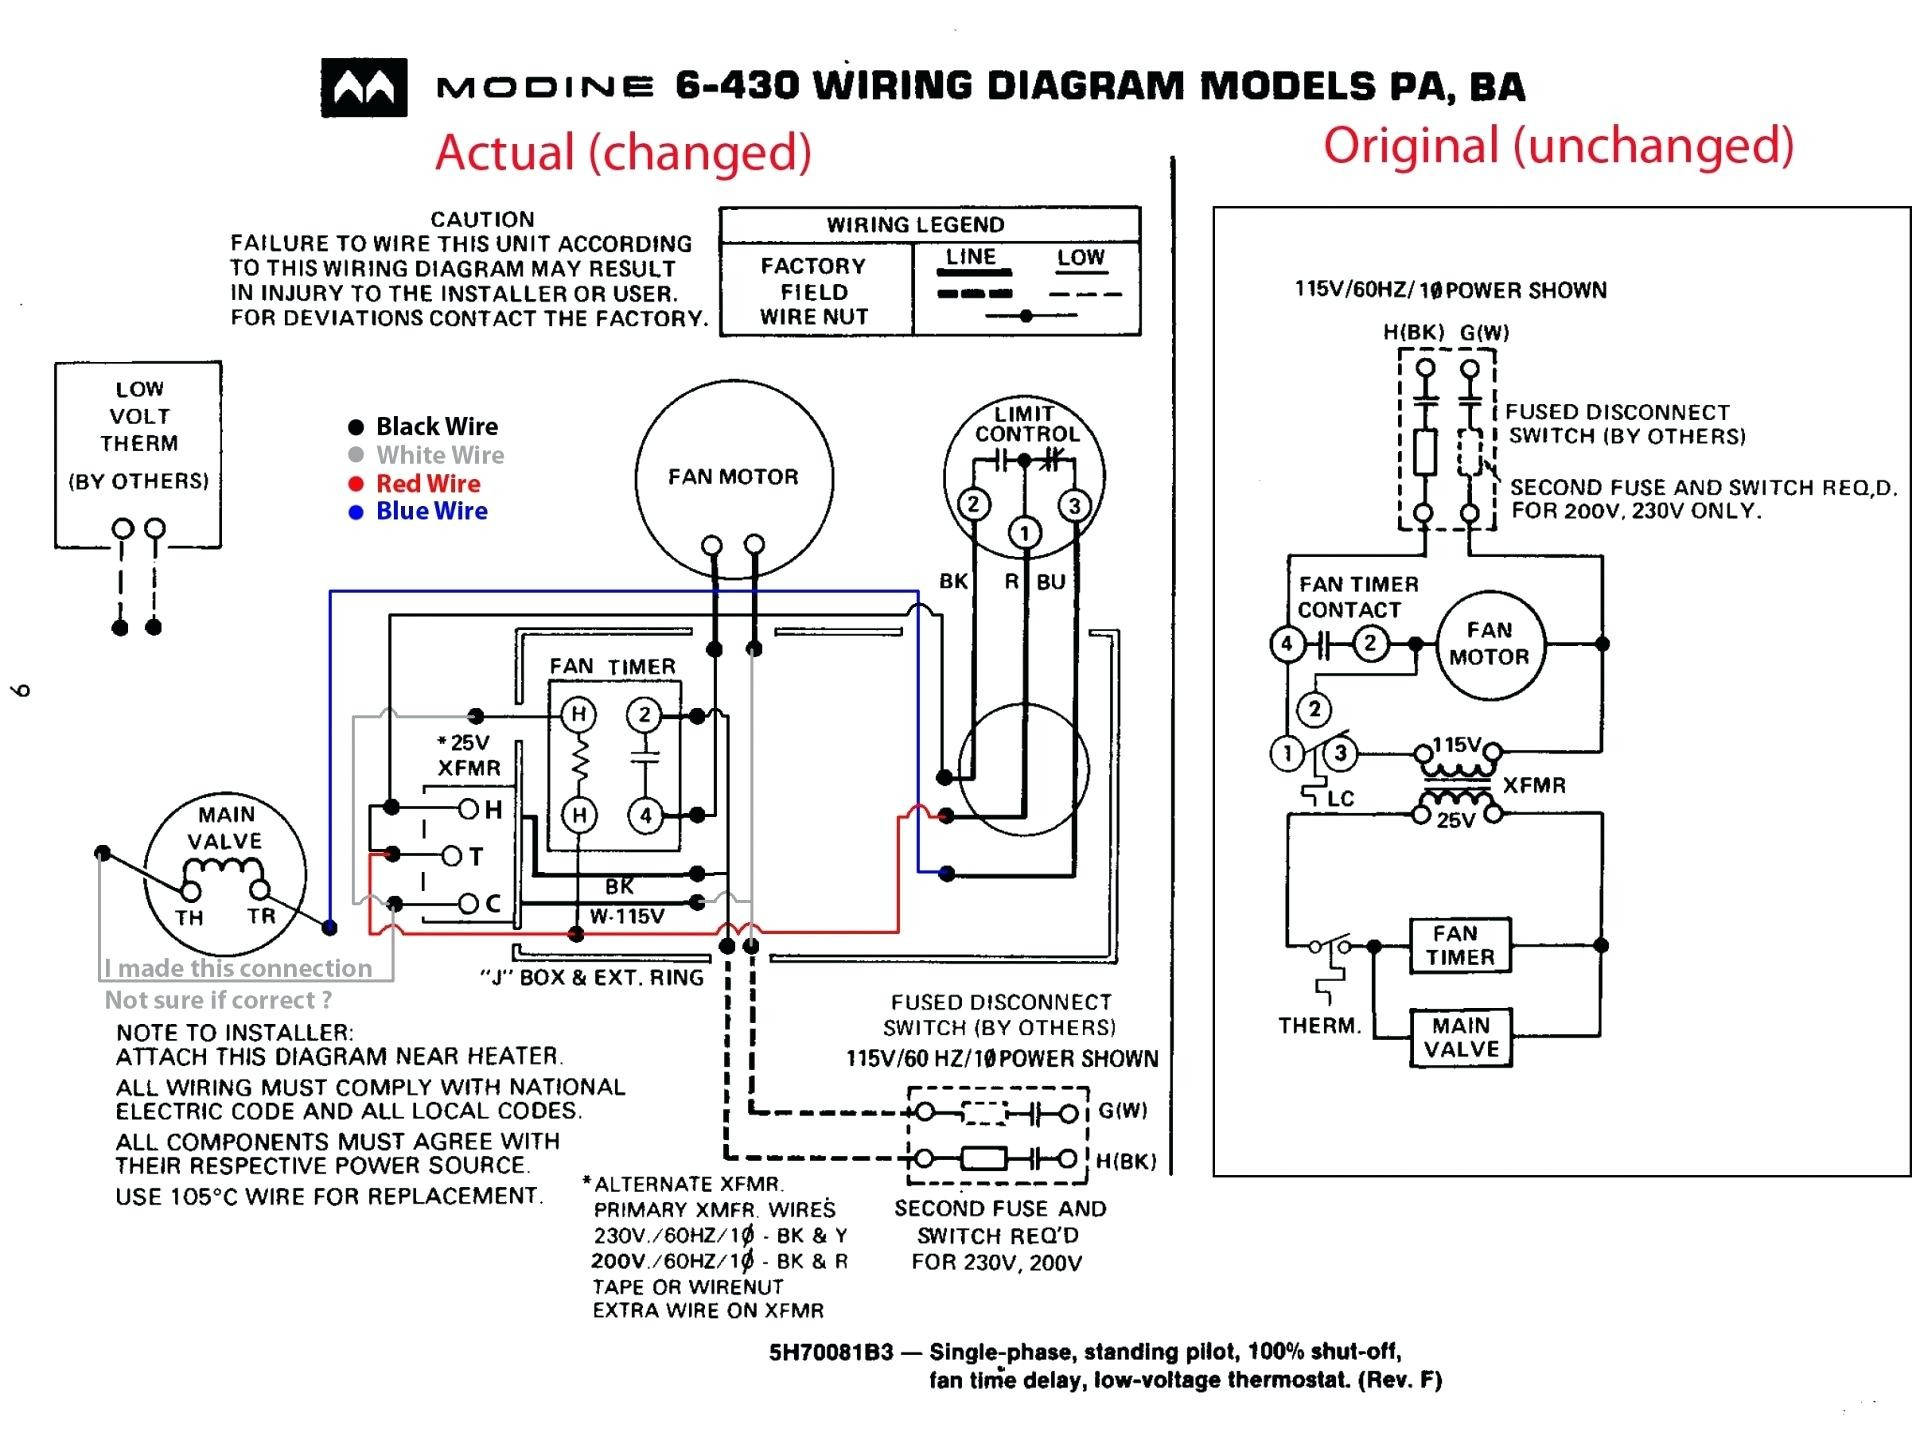 Honeywell s8610u wiring diagram honeywell fan relays wiring diagrams honeywell fan relays wiring diagrams wiring diagram cheapraybanclubmaster Image collections